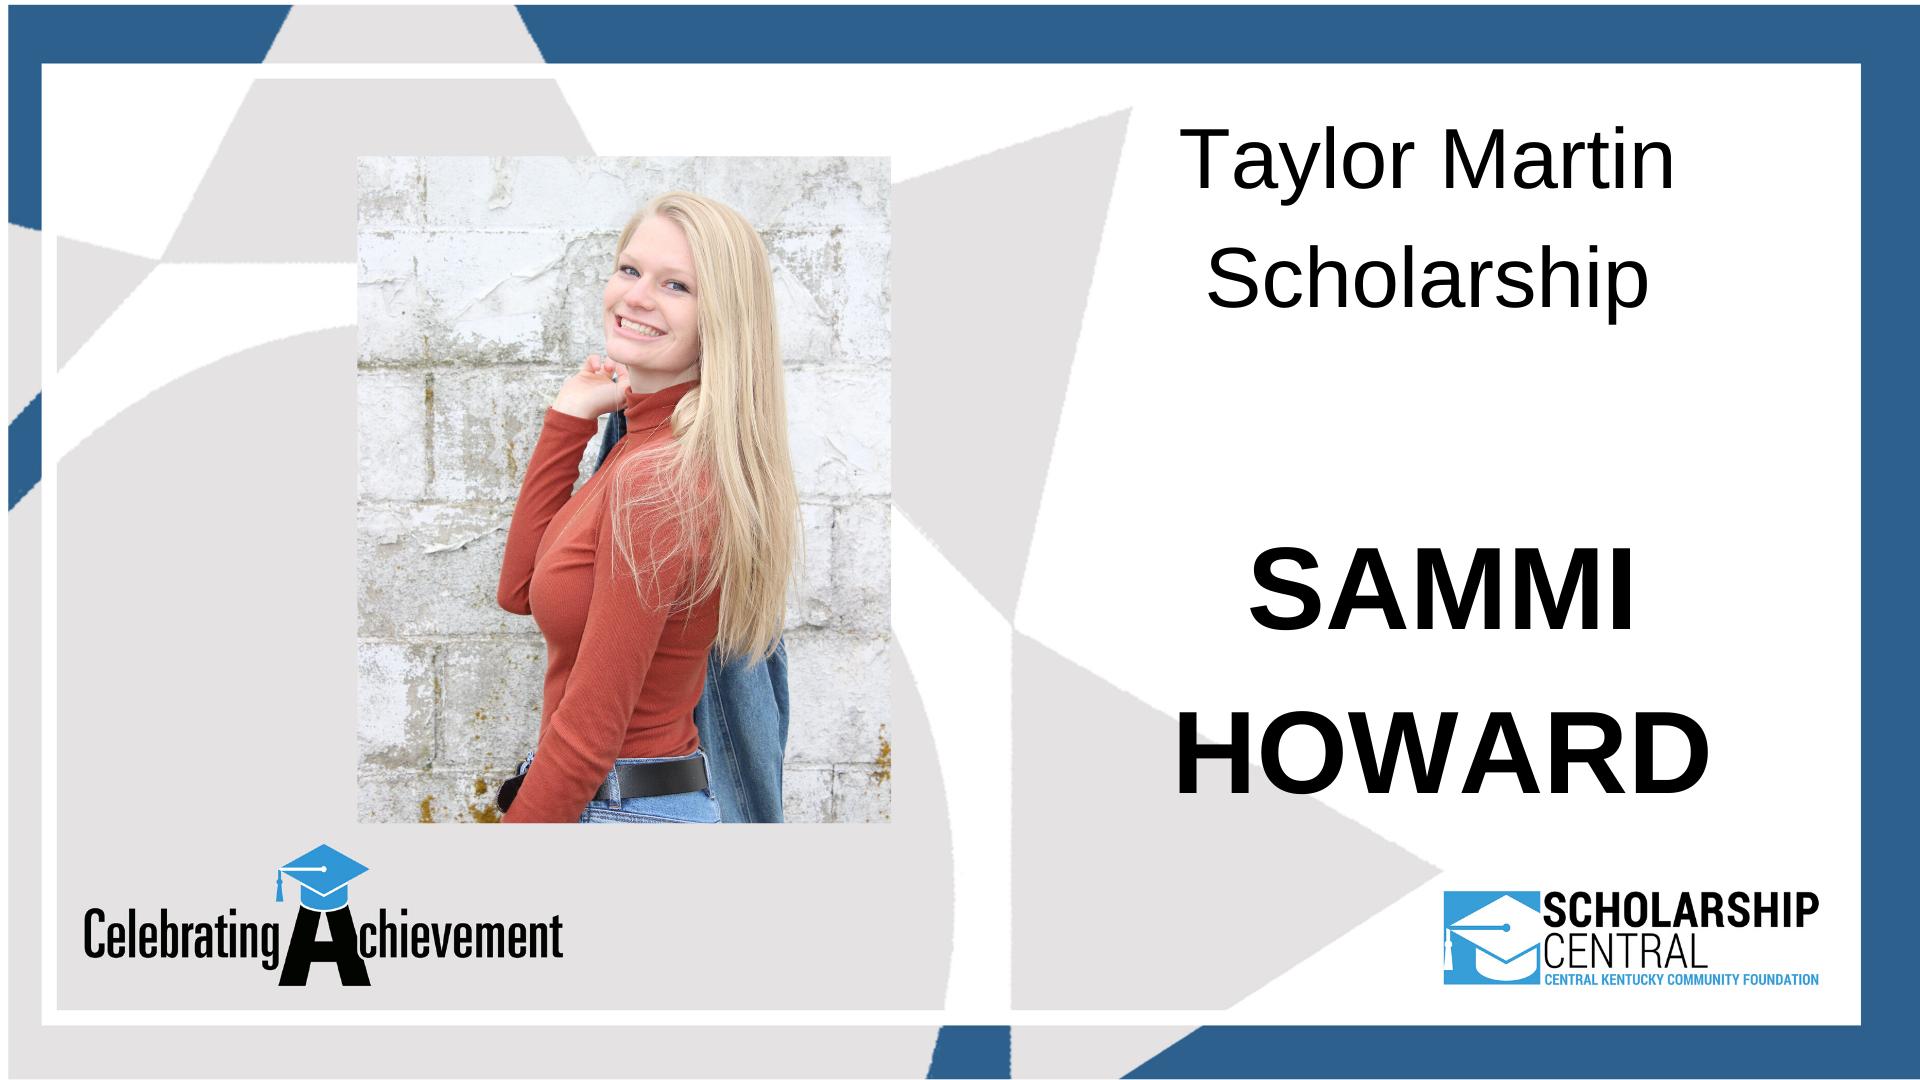 Taylor Martin Scholarship